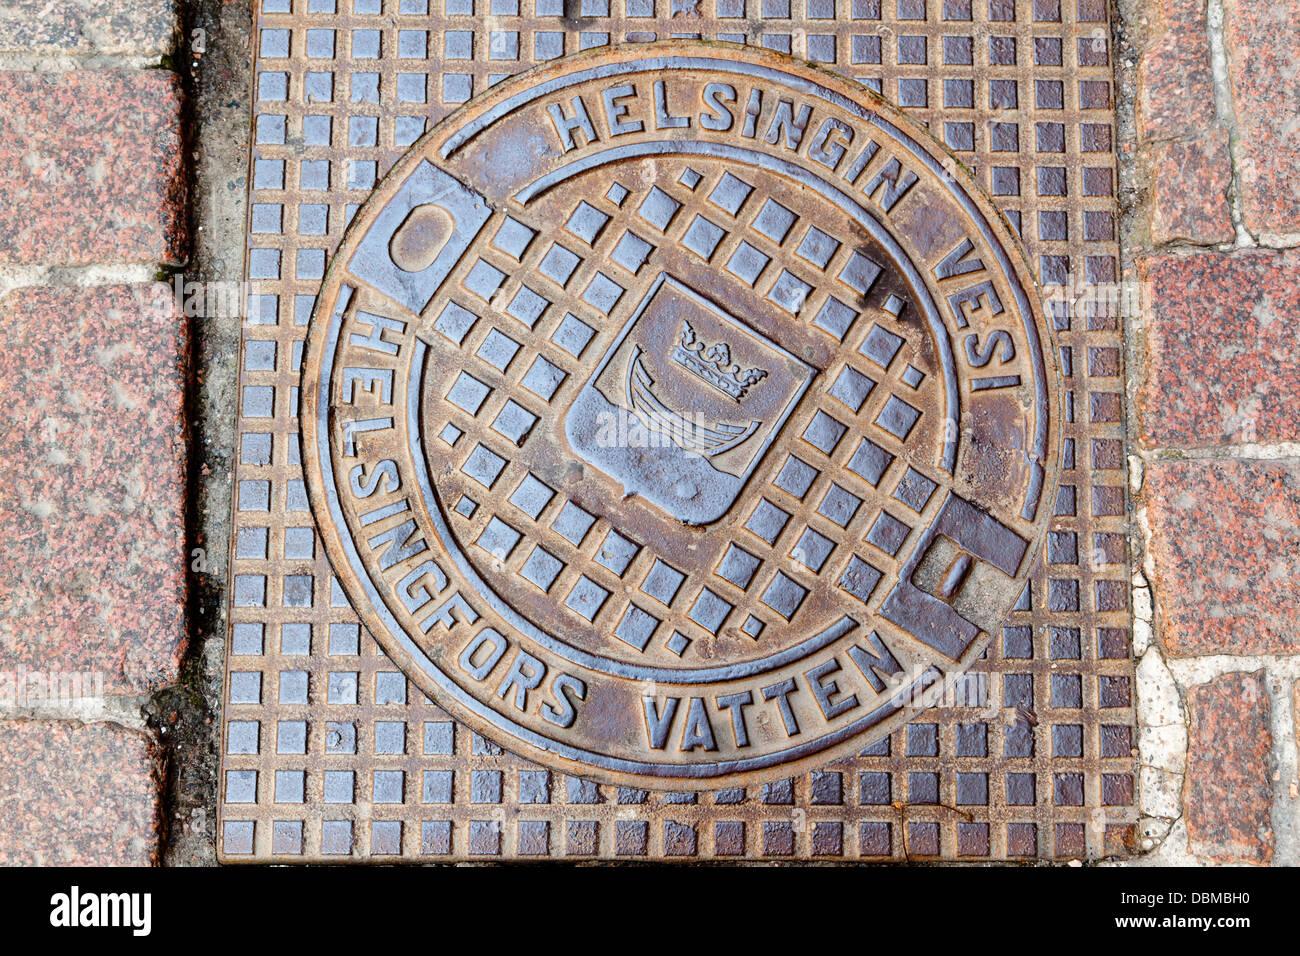 Manhole cover in  Helsinki - Stock Image